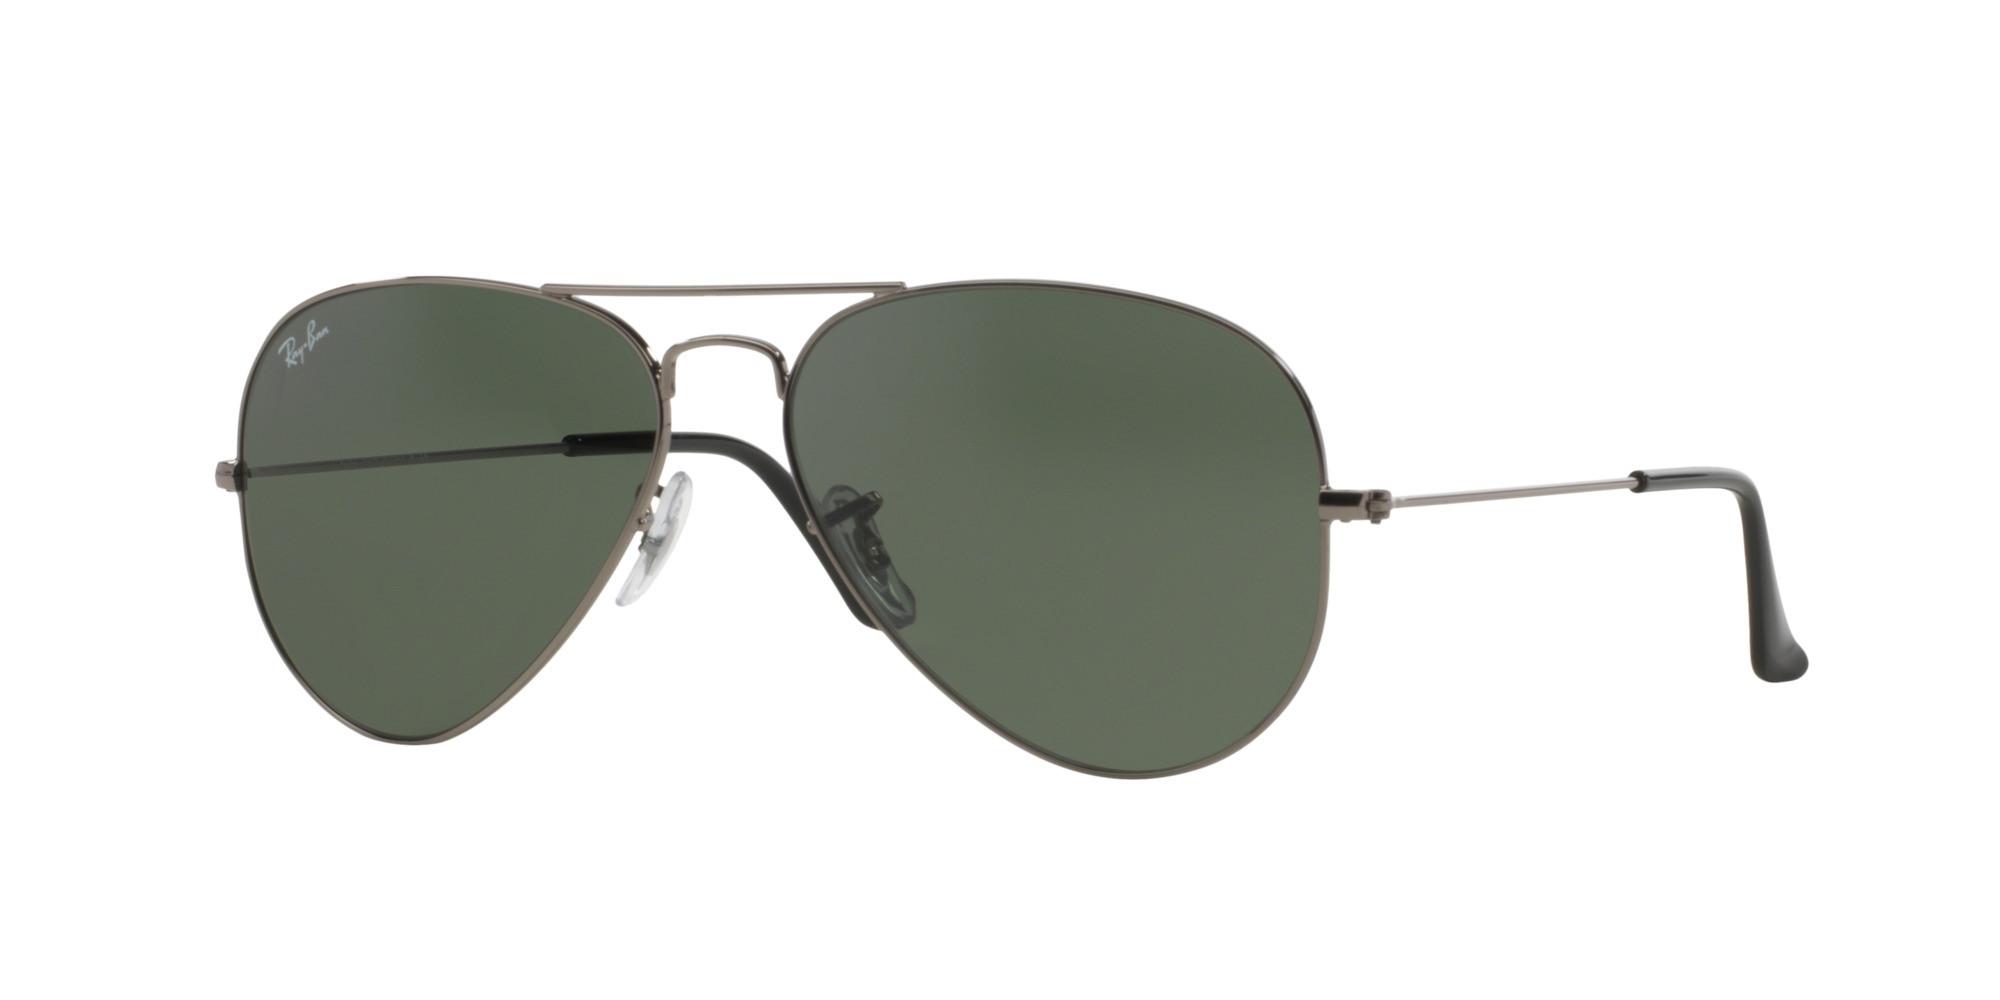 Gafas de sol RAY-BAN AVIATOR RB 3025 W0879